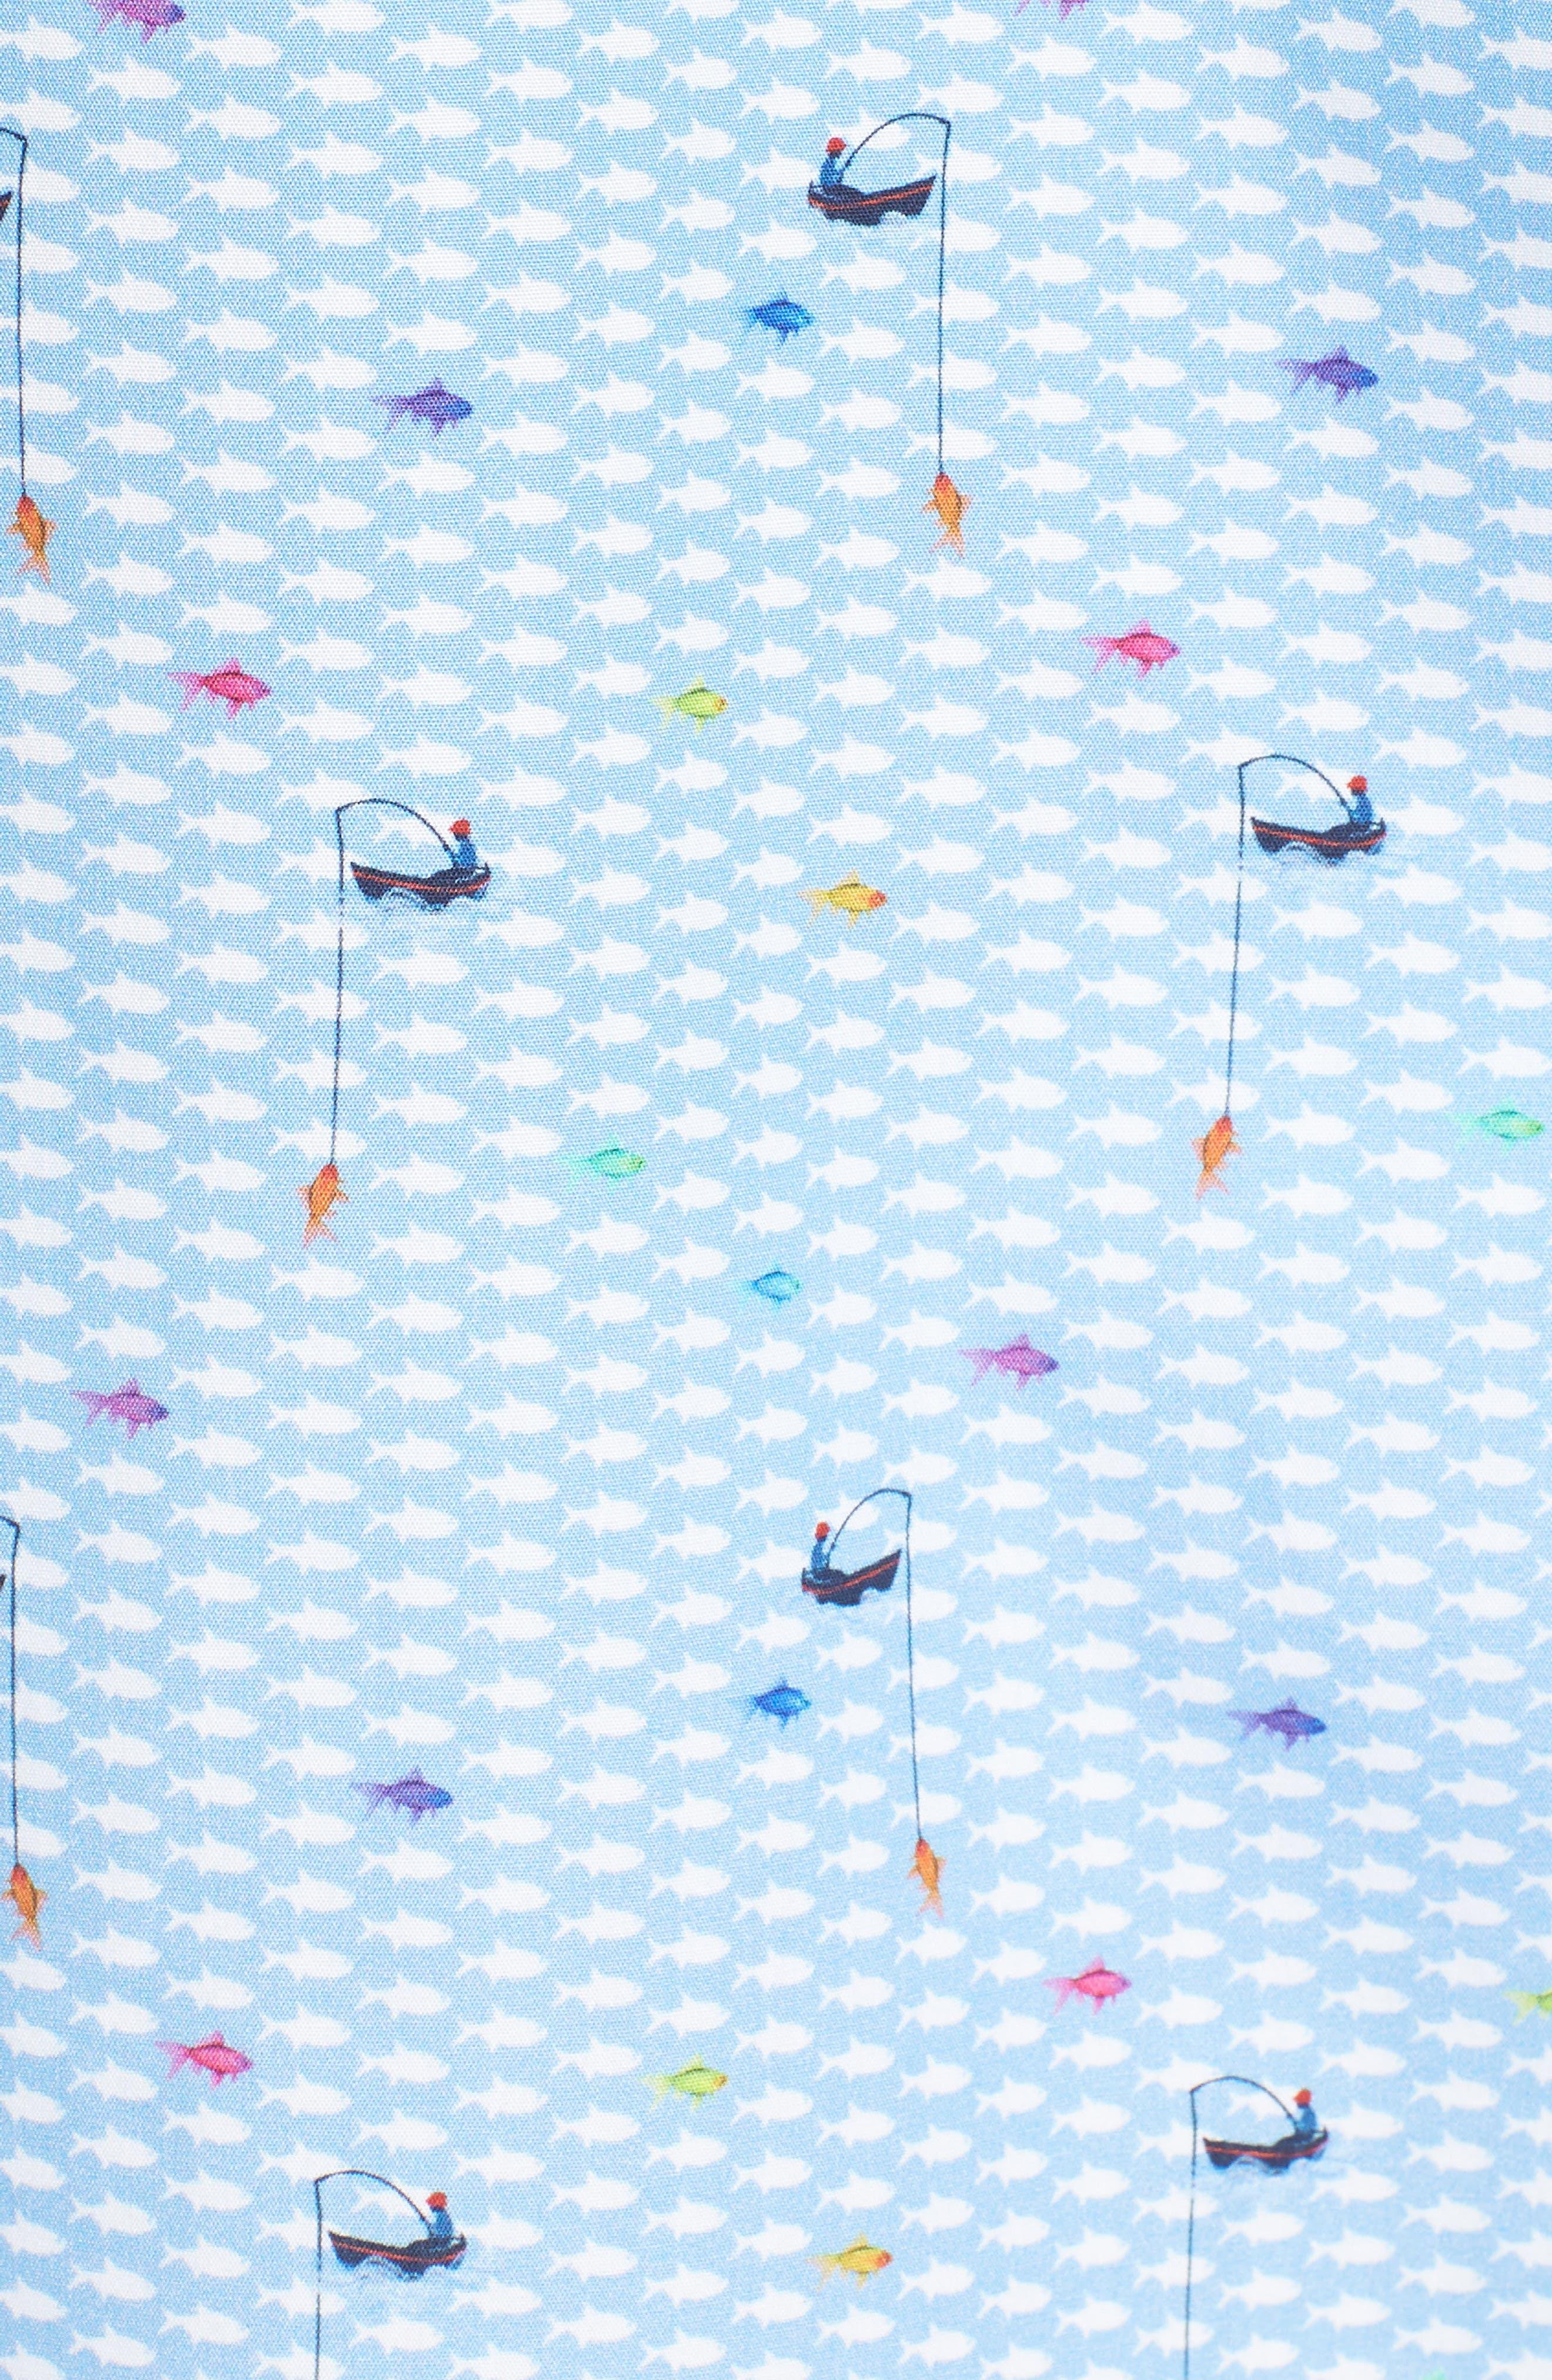 Classic Fit Fisherman Print Sport Shirt,                             Alternate thumbnail 5, color,                             Air Blue